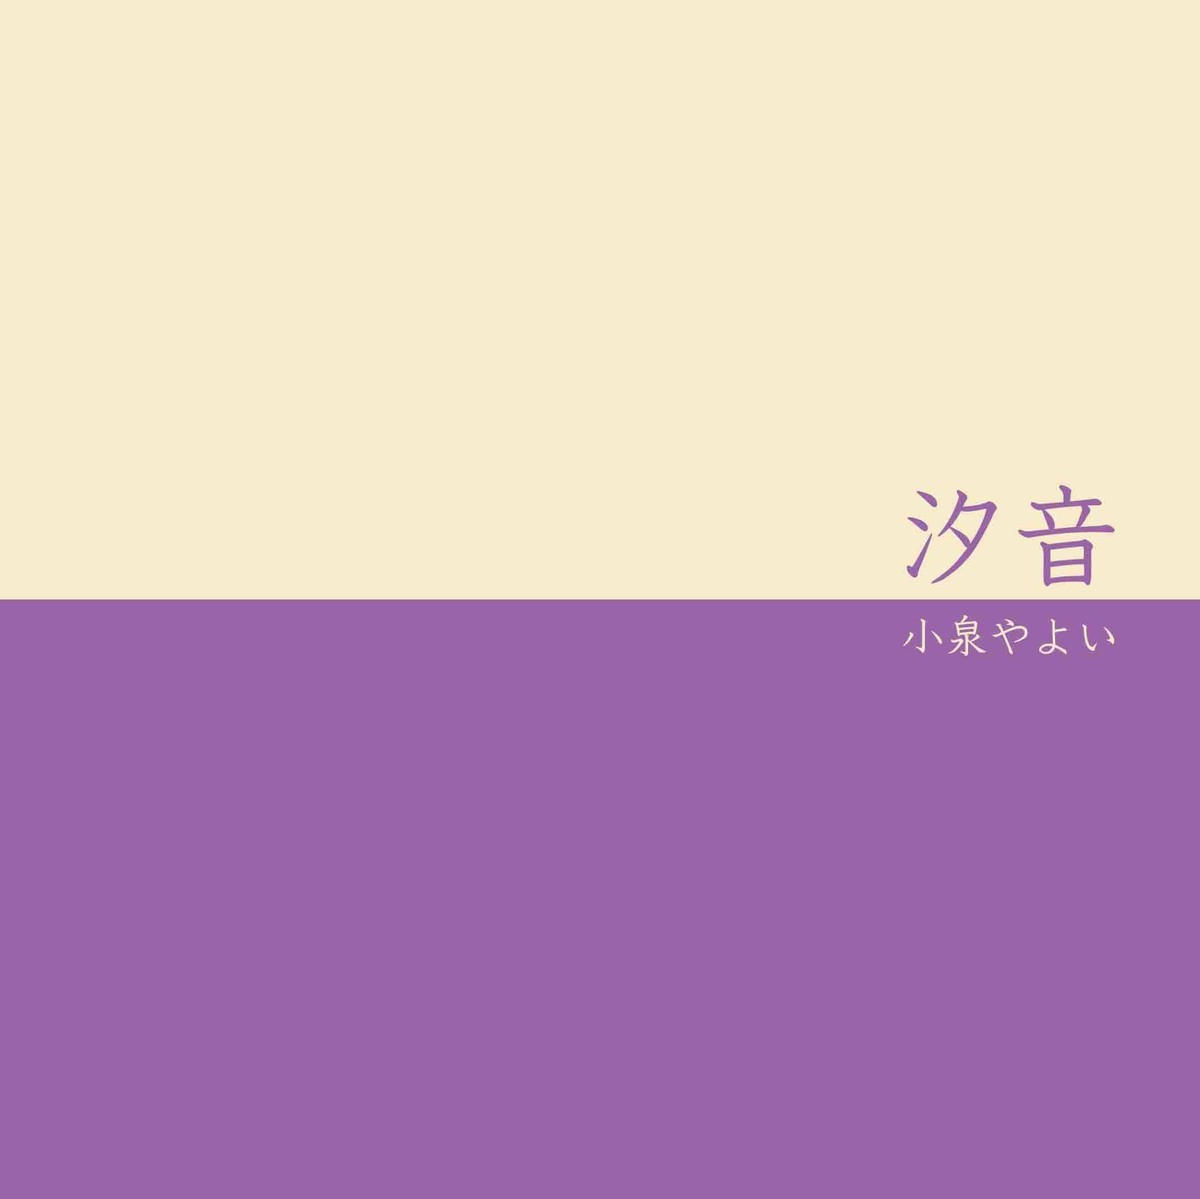 f:id:yayoi-k:20191110212931j:plain